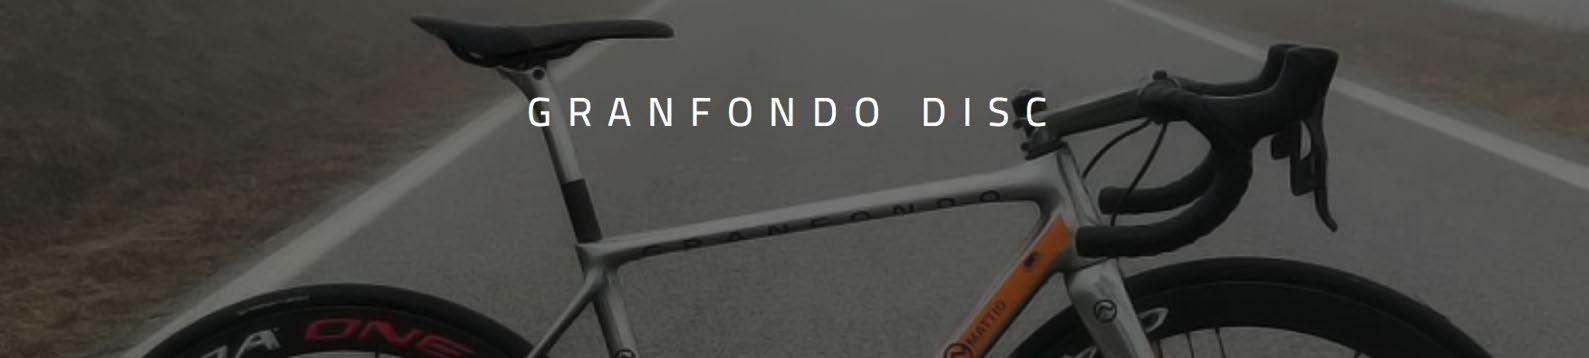 Officine Mattio vélo sur-mesure